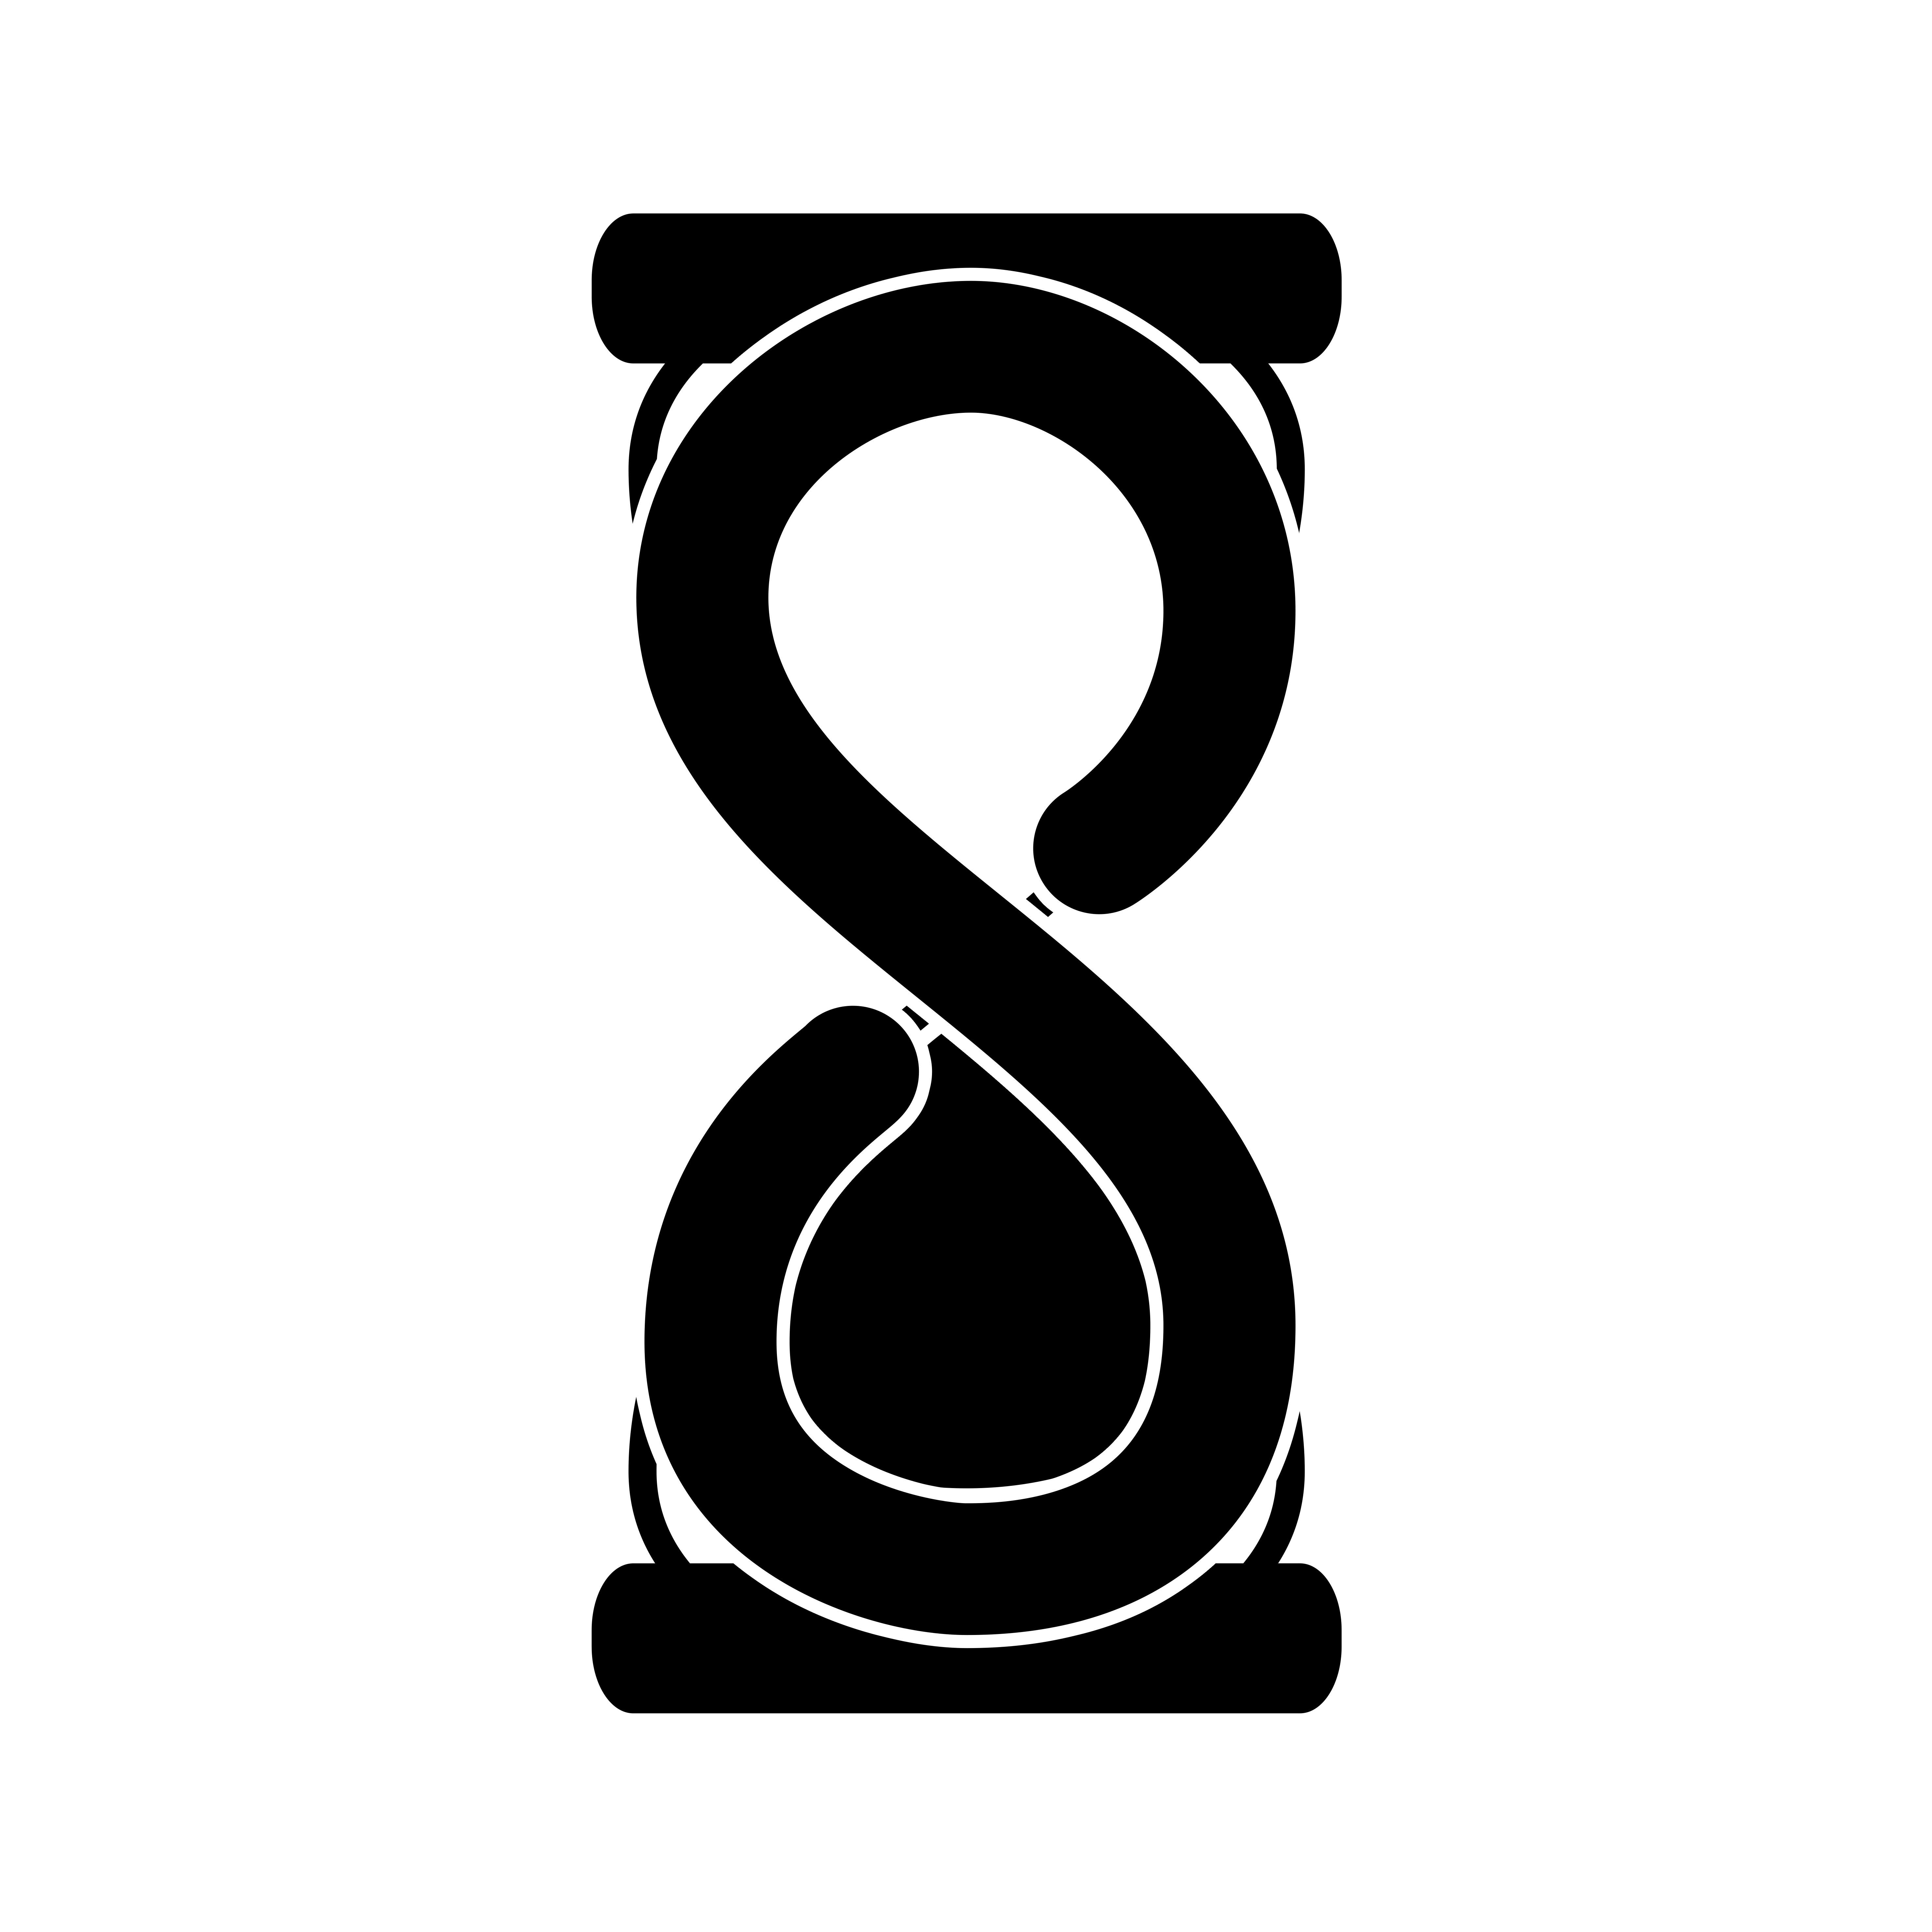 Analogous i decided to choose a harmonious the atomic symbol biocorpaavc Gallery